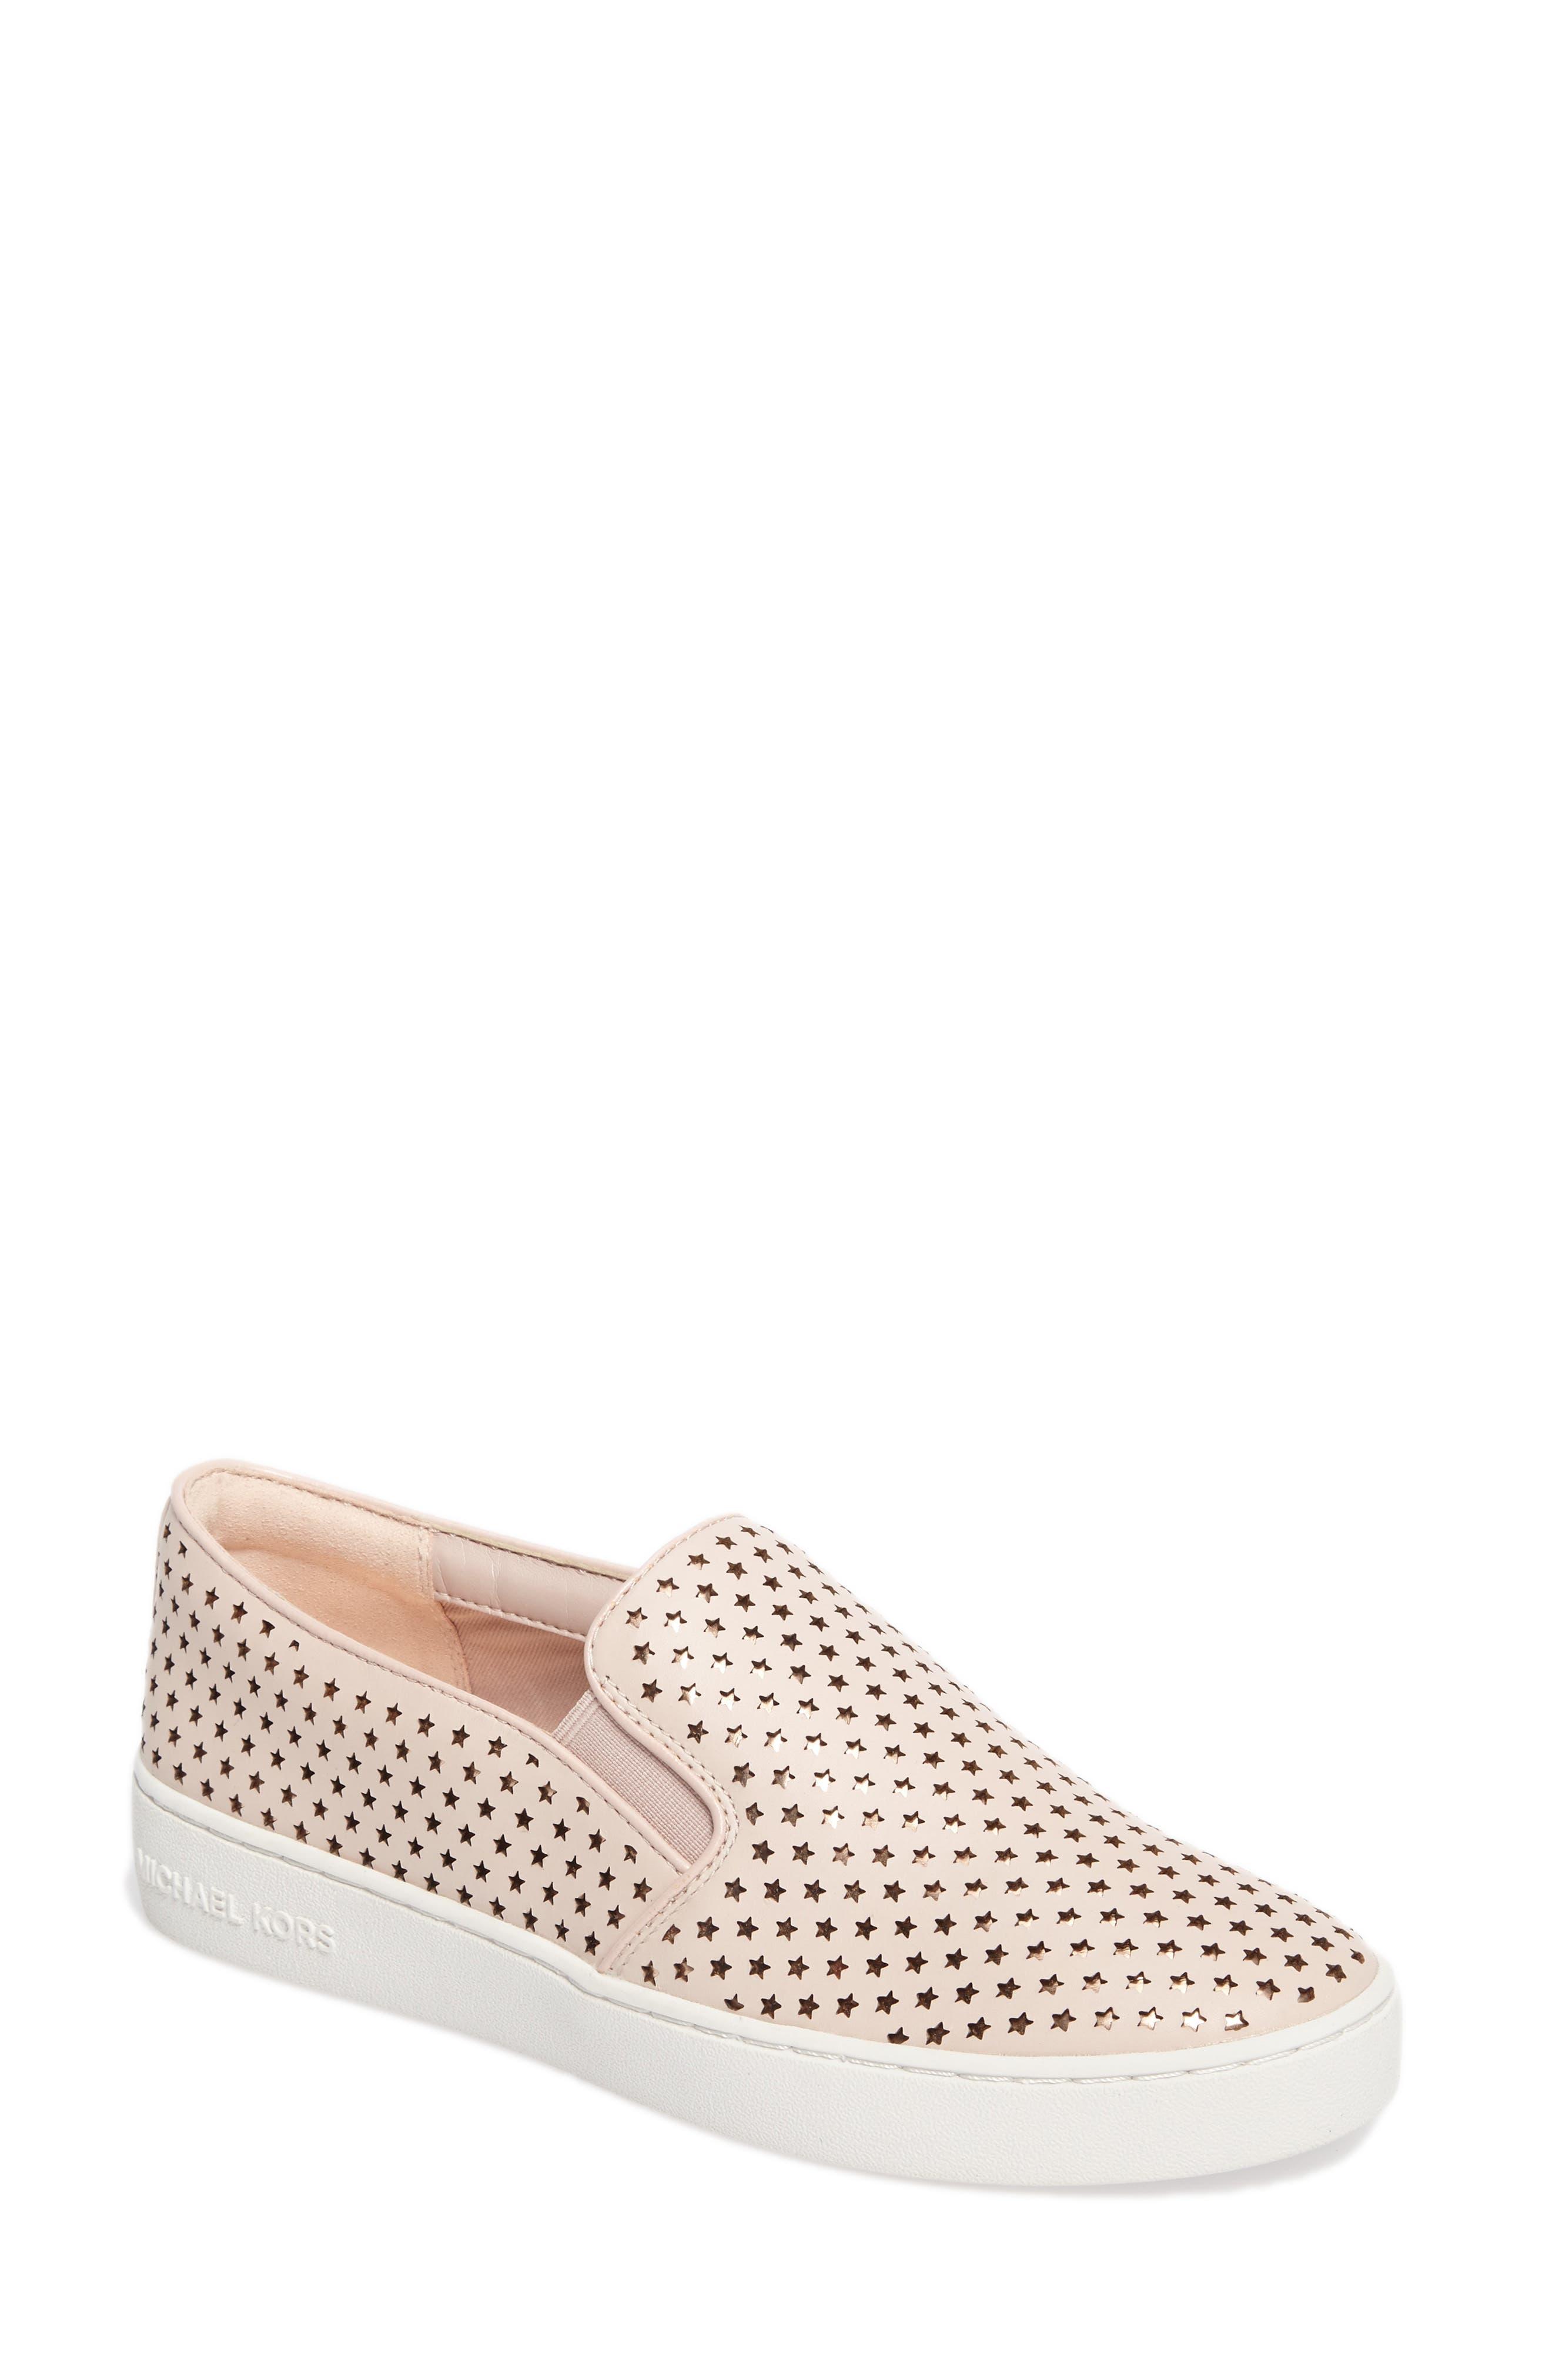 MICHAEL Michael Kors Keaton SlipOn Sneaker Women